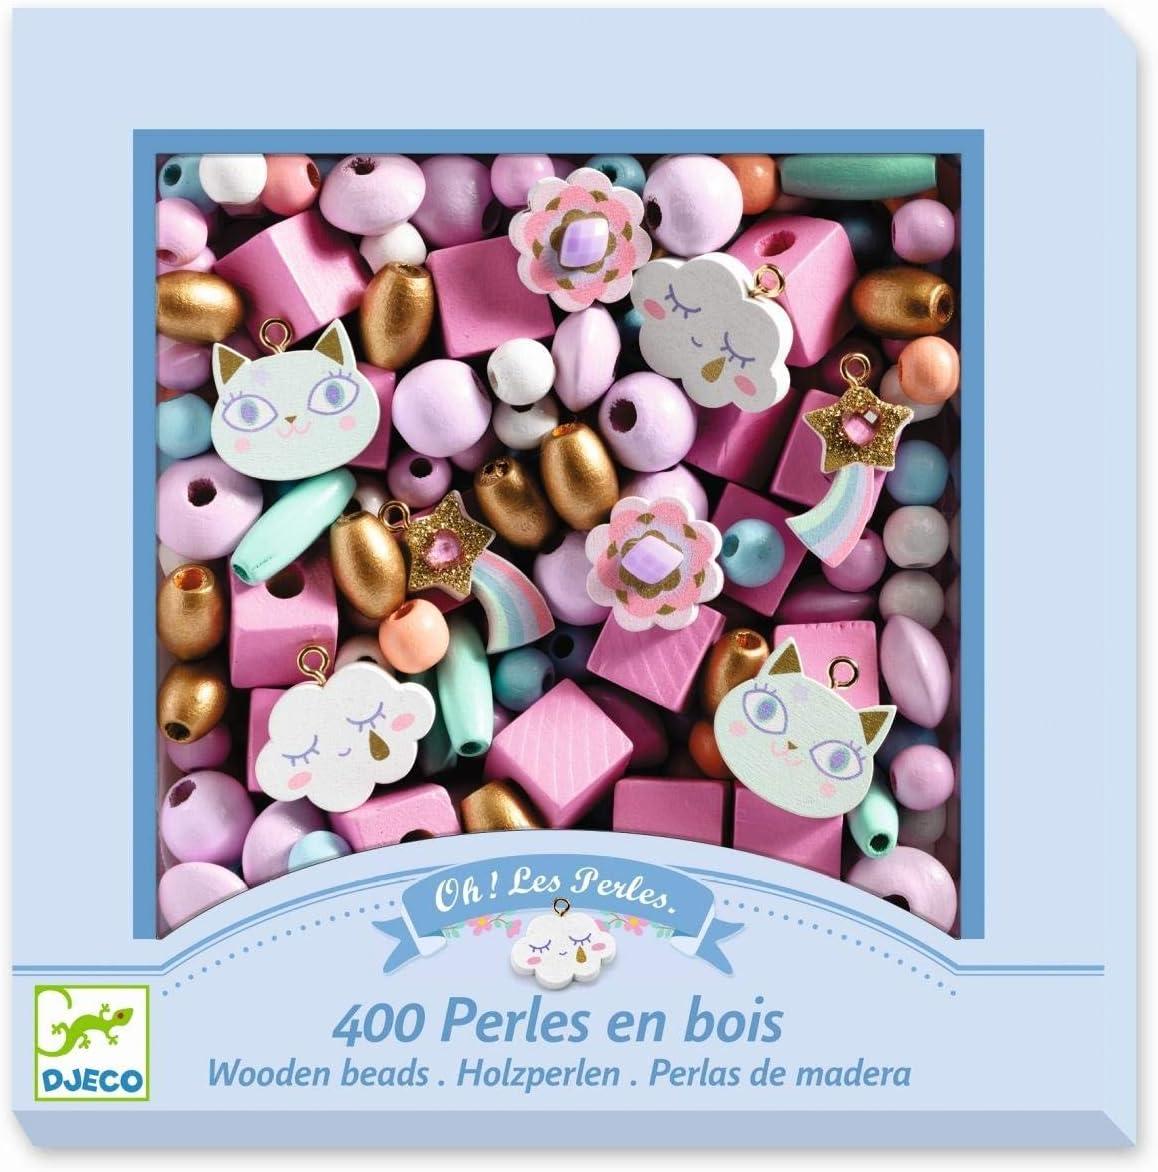 Arc-en-Ciel Djeco Perles Bois